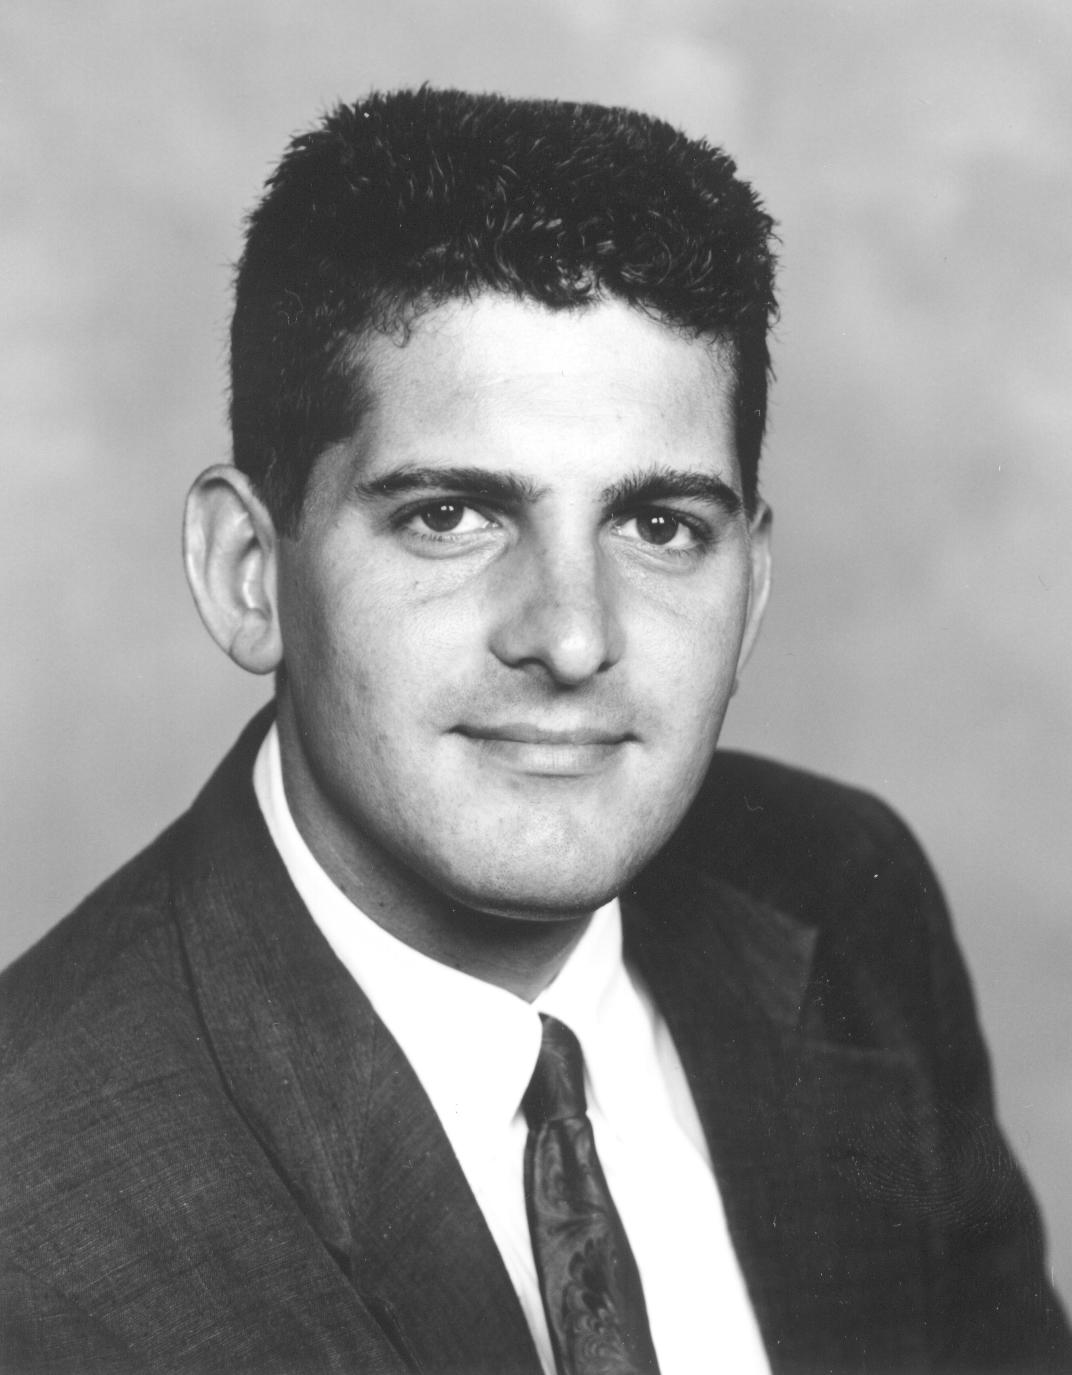 Michael Nelson